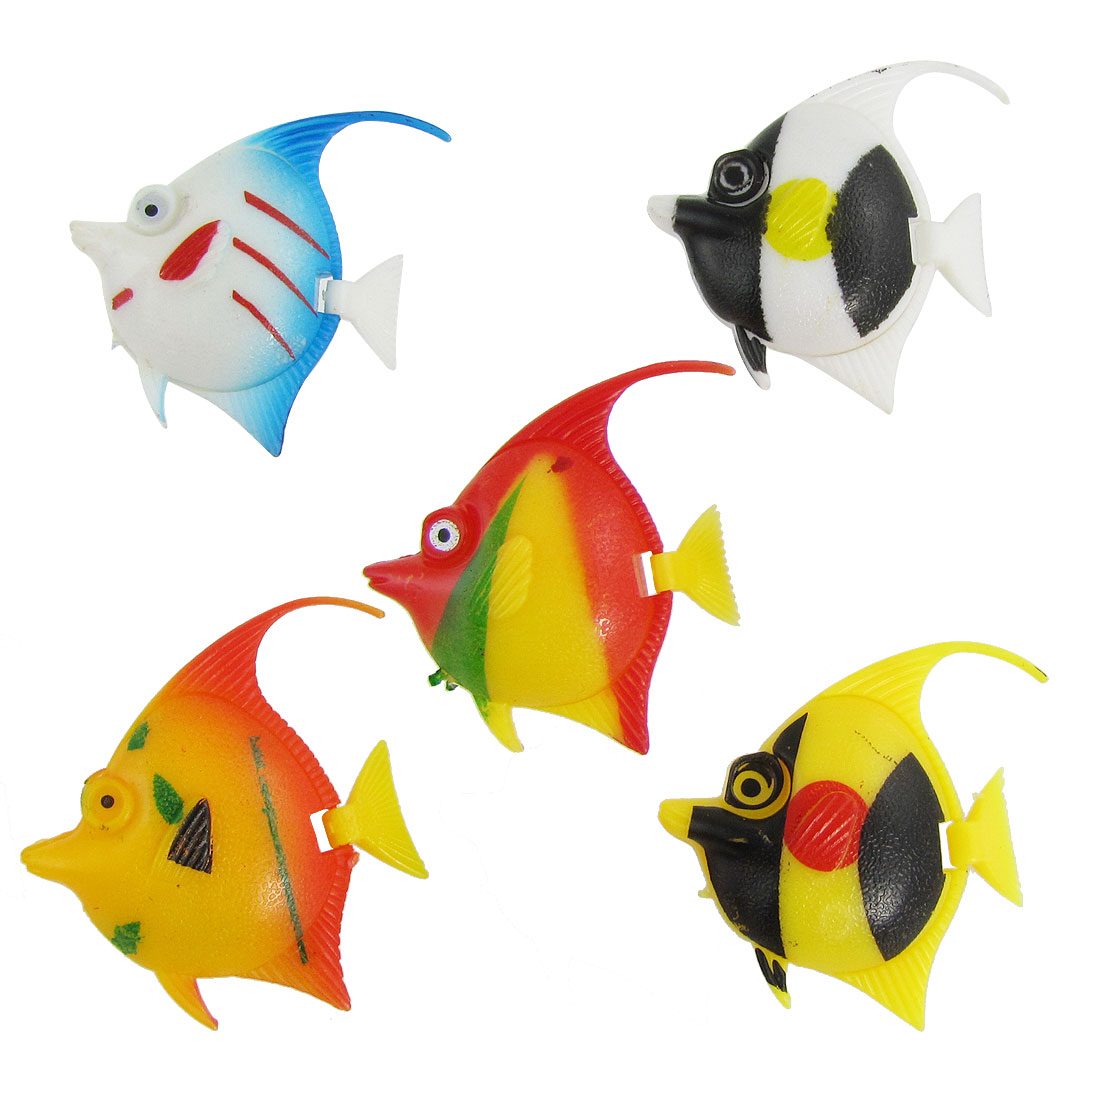 5 Pcs Multicolor Plastic Swing Tail Tropical Fish Aquarium Ornament Decoration